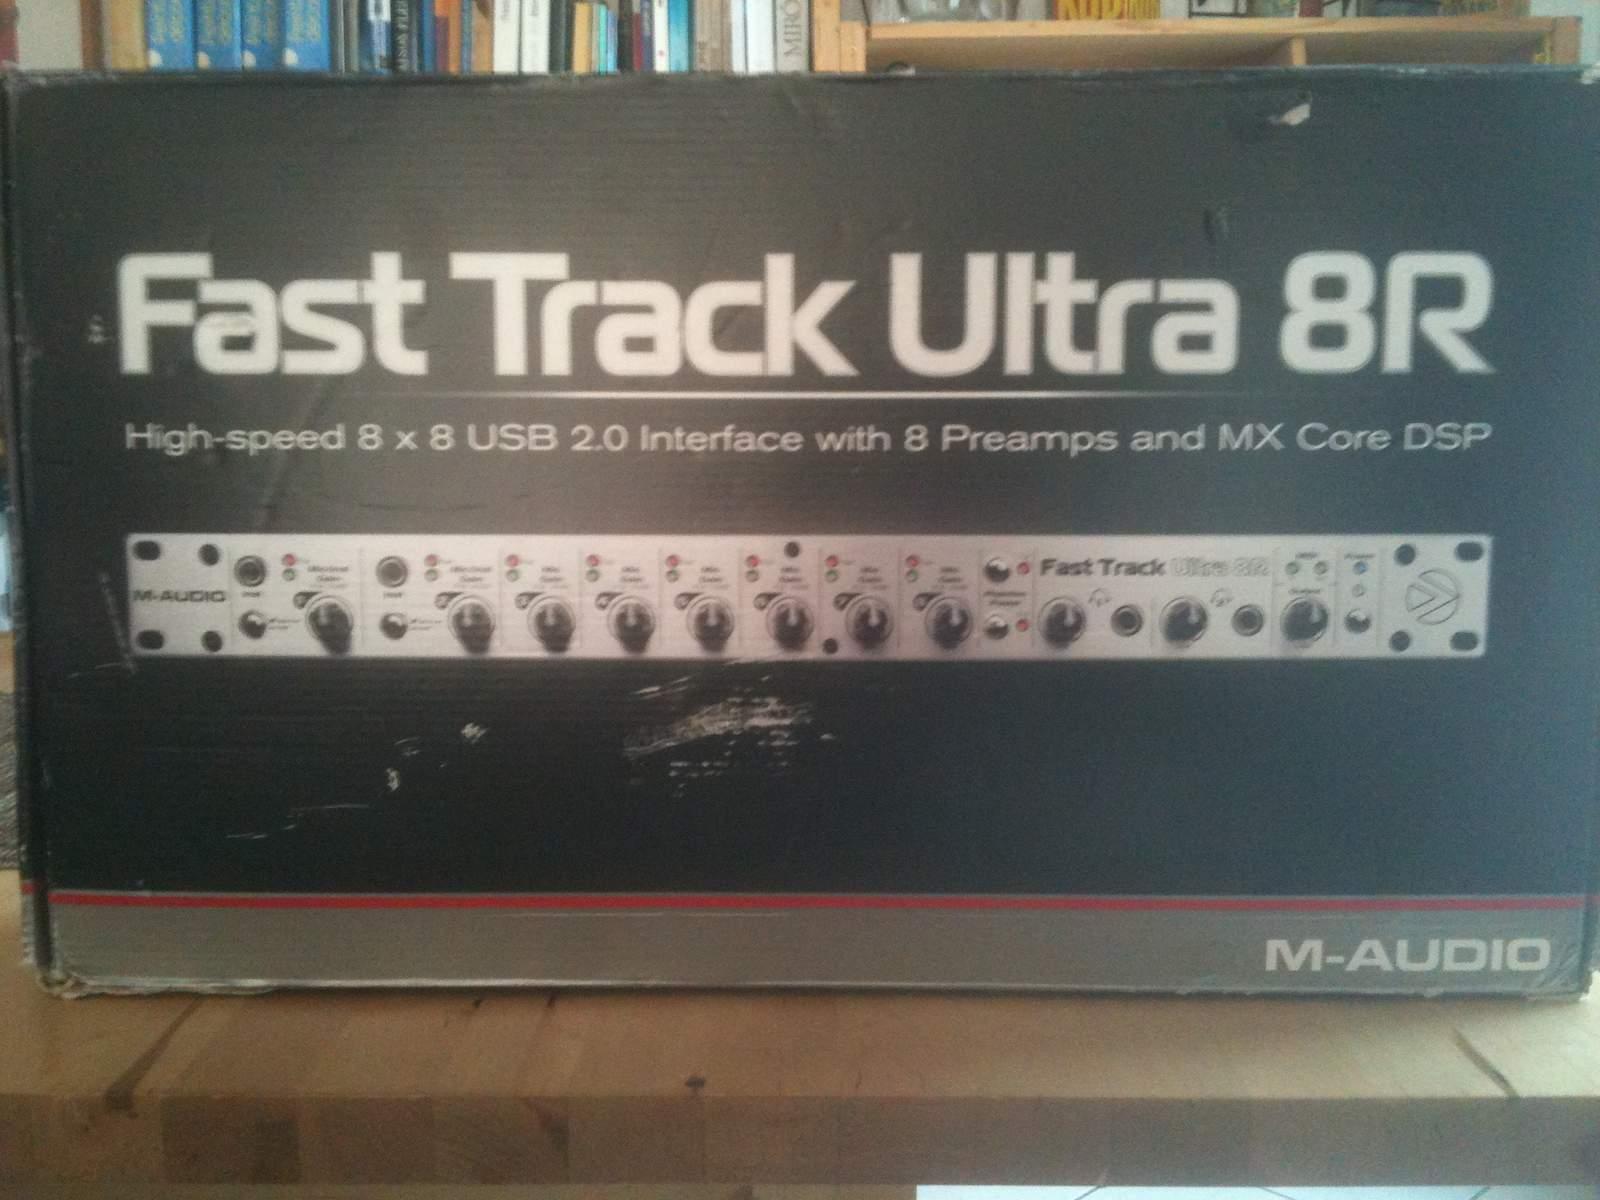 m audio fast track ultra 8r image 186325 audiofanzine. Black Bedroom Furniture Sets. Home Design Ideas